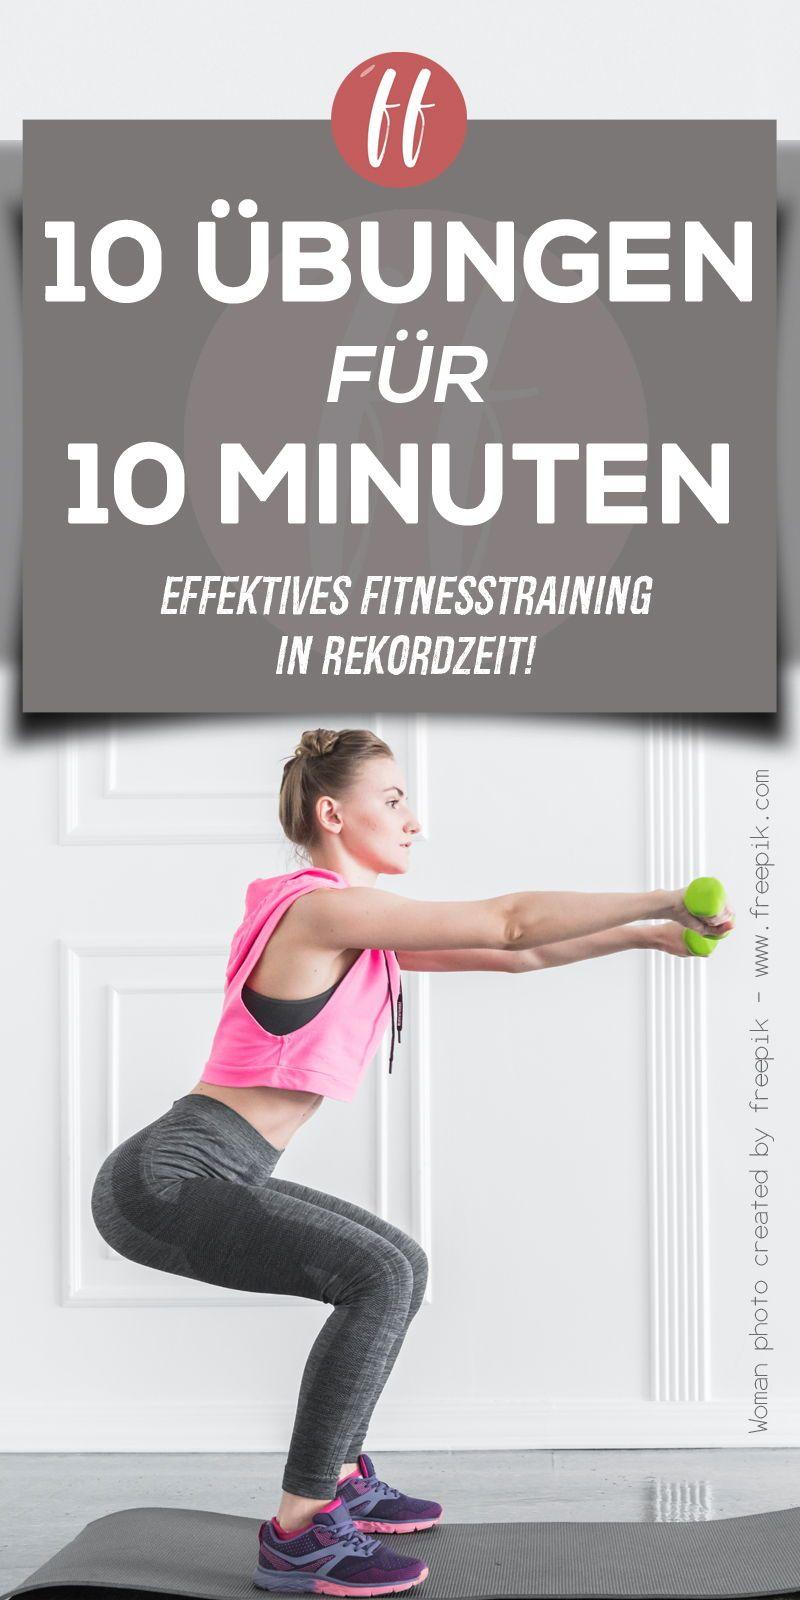 FitFeminin • Das Frauen & Fitness Onlinemagazin.